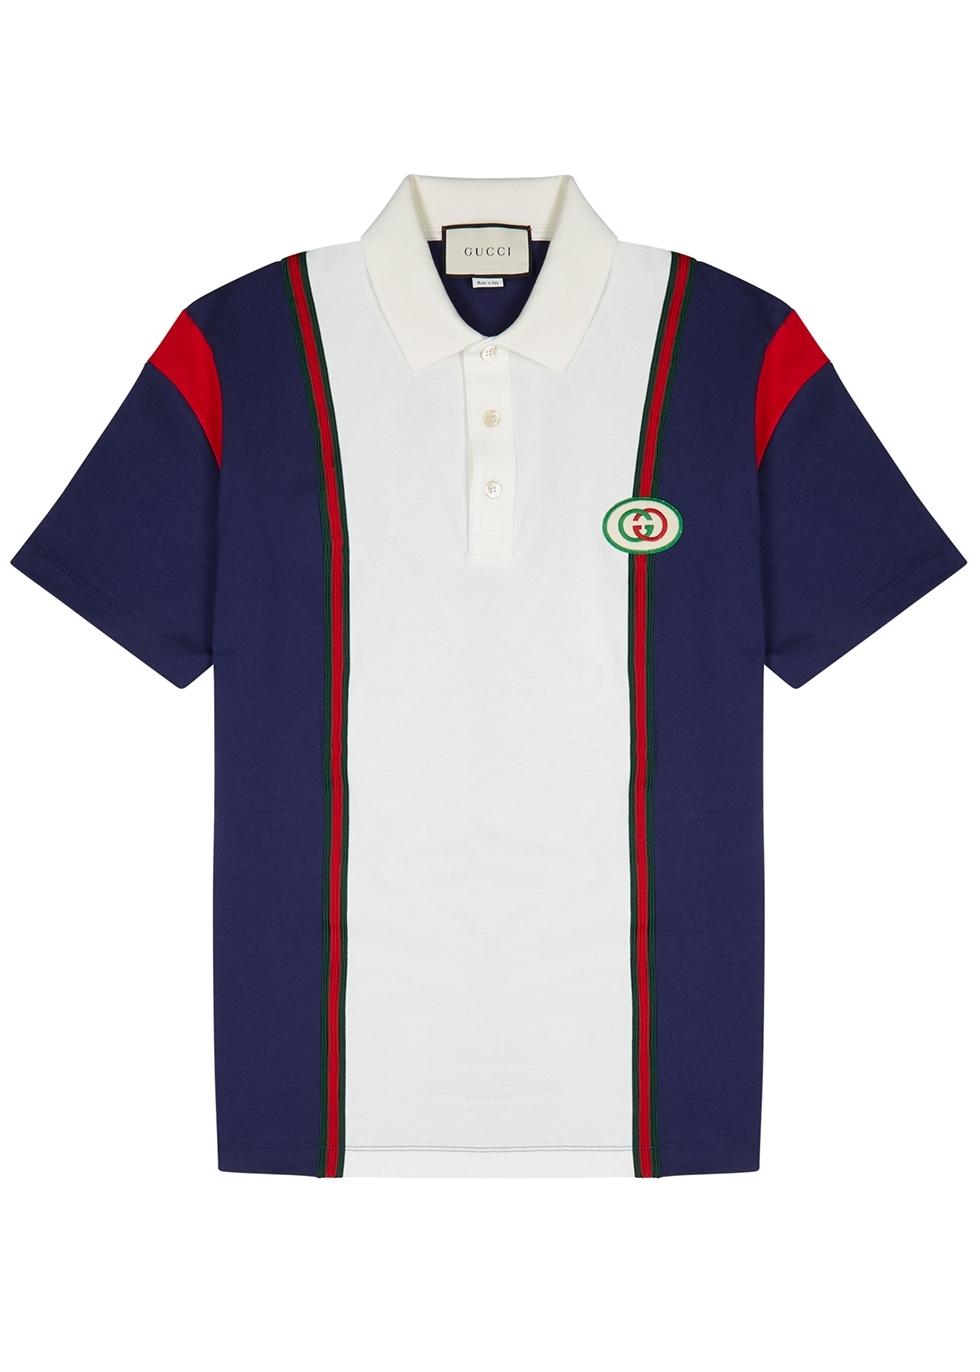 a60db9f729c Gucci Polo Shirts - Mens - Harvey Nichols